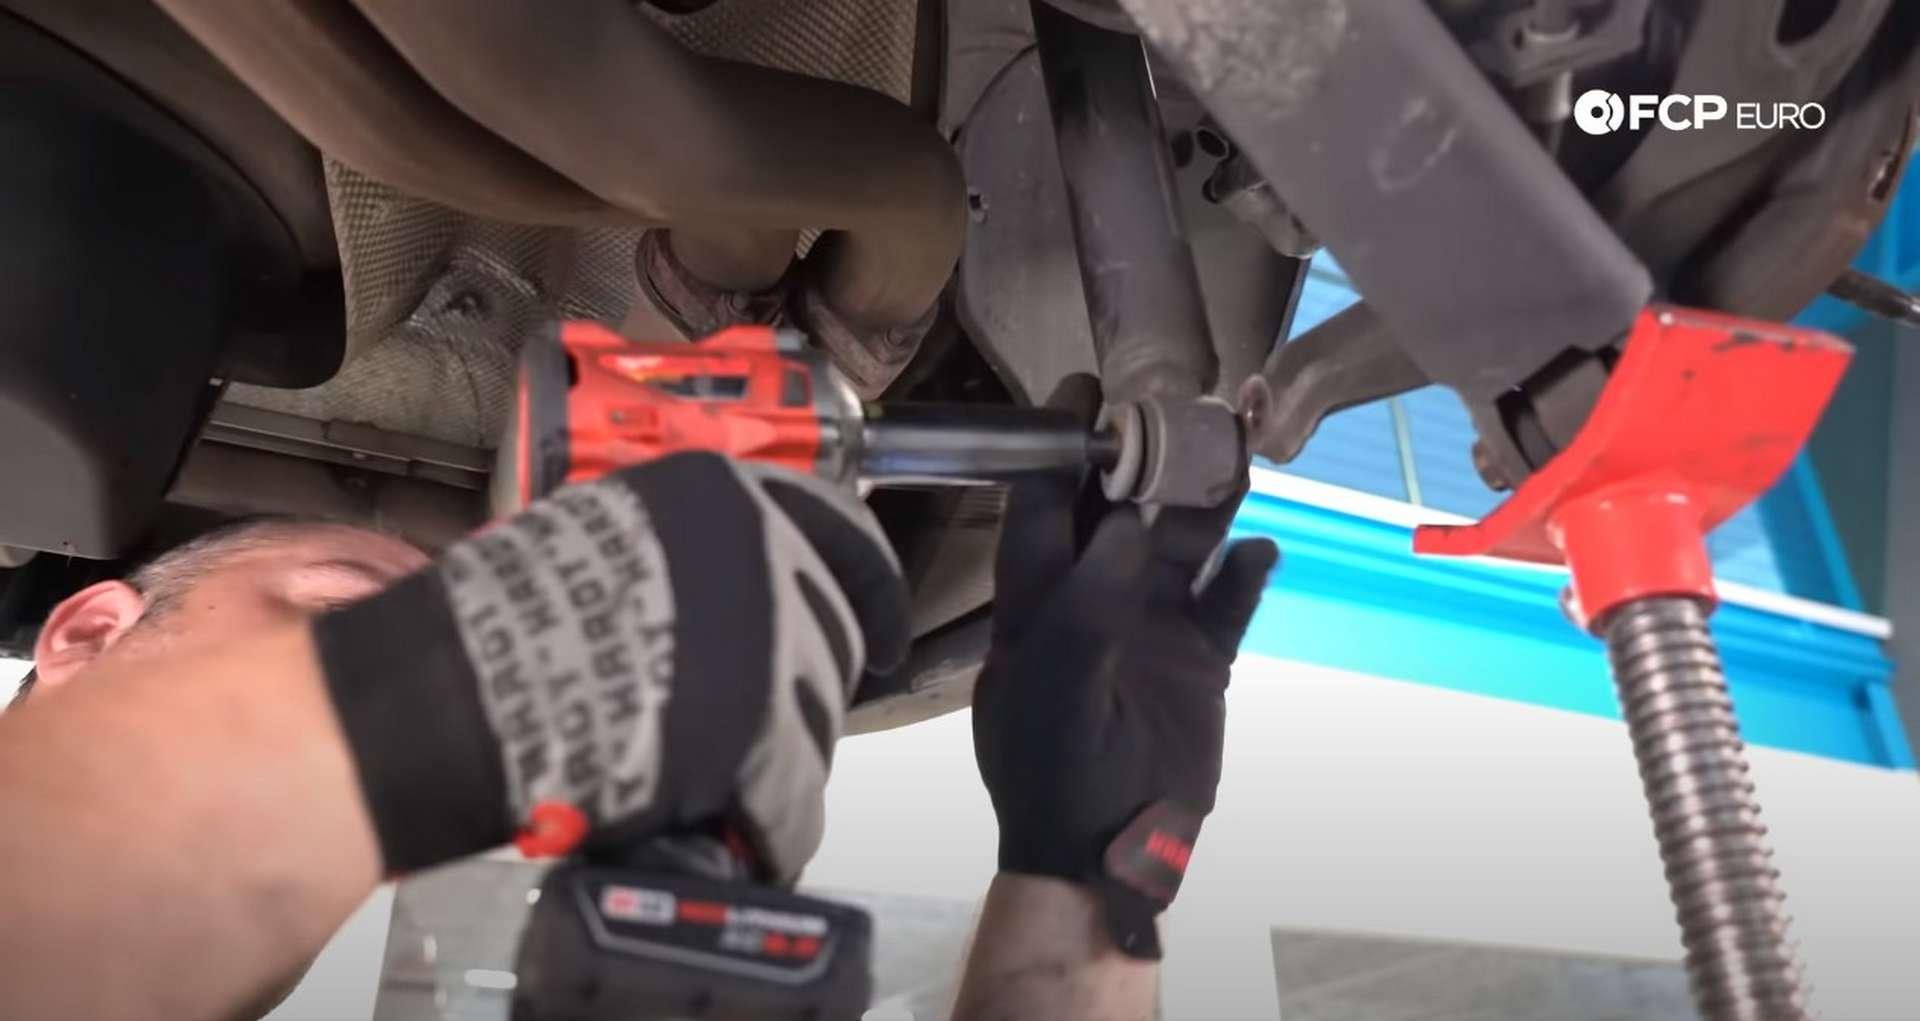 DIY E46 BMW M3 Rear Subframe Refresh Part 3 installing the lower shock bolt